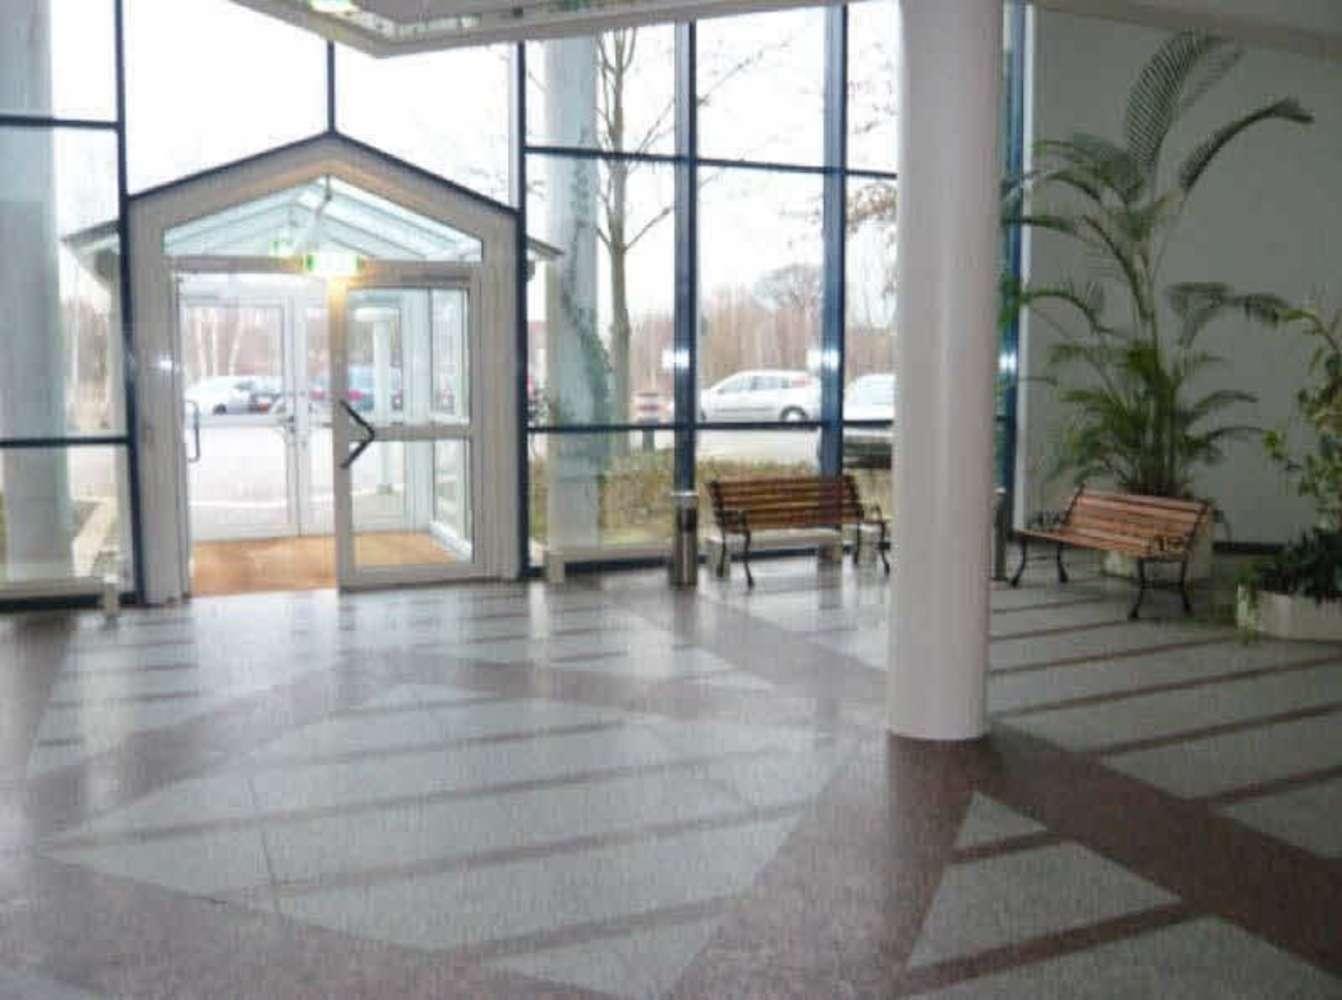 Büros Langen (hessen), 63225 - Büro - Langen (Hessen), Industriegebiet - F0169 - 9412544